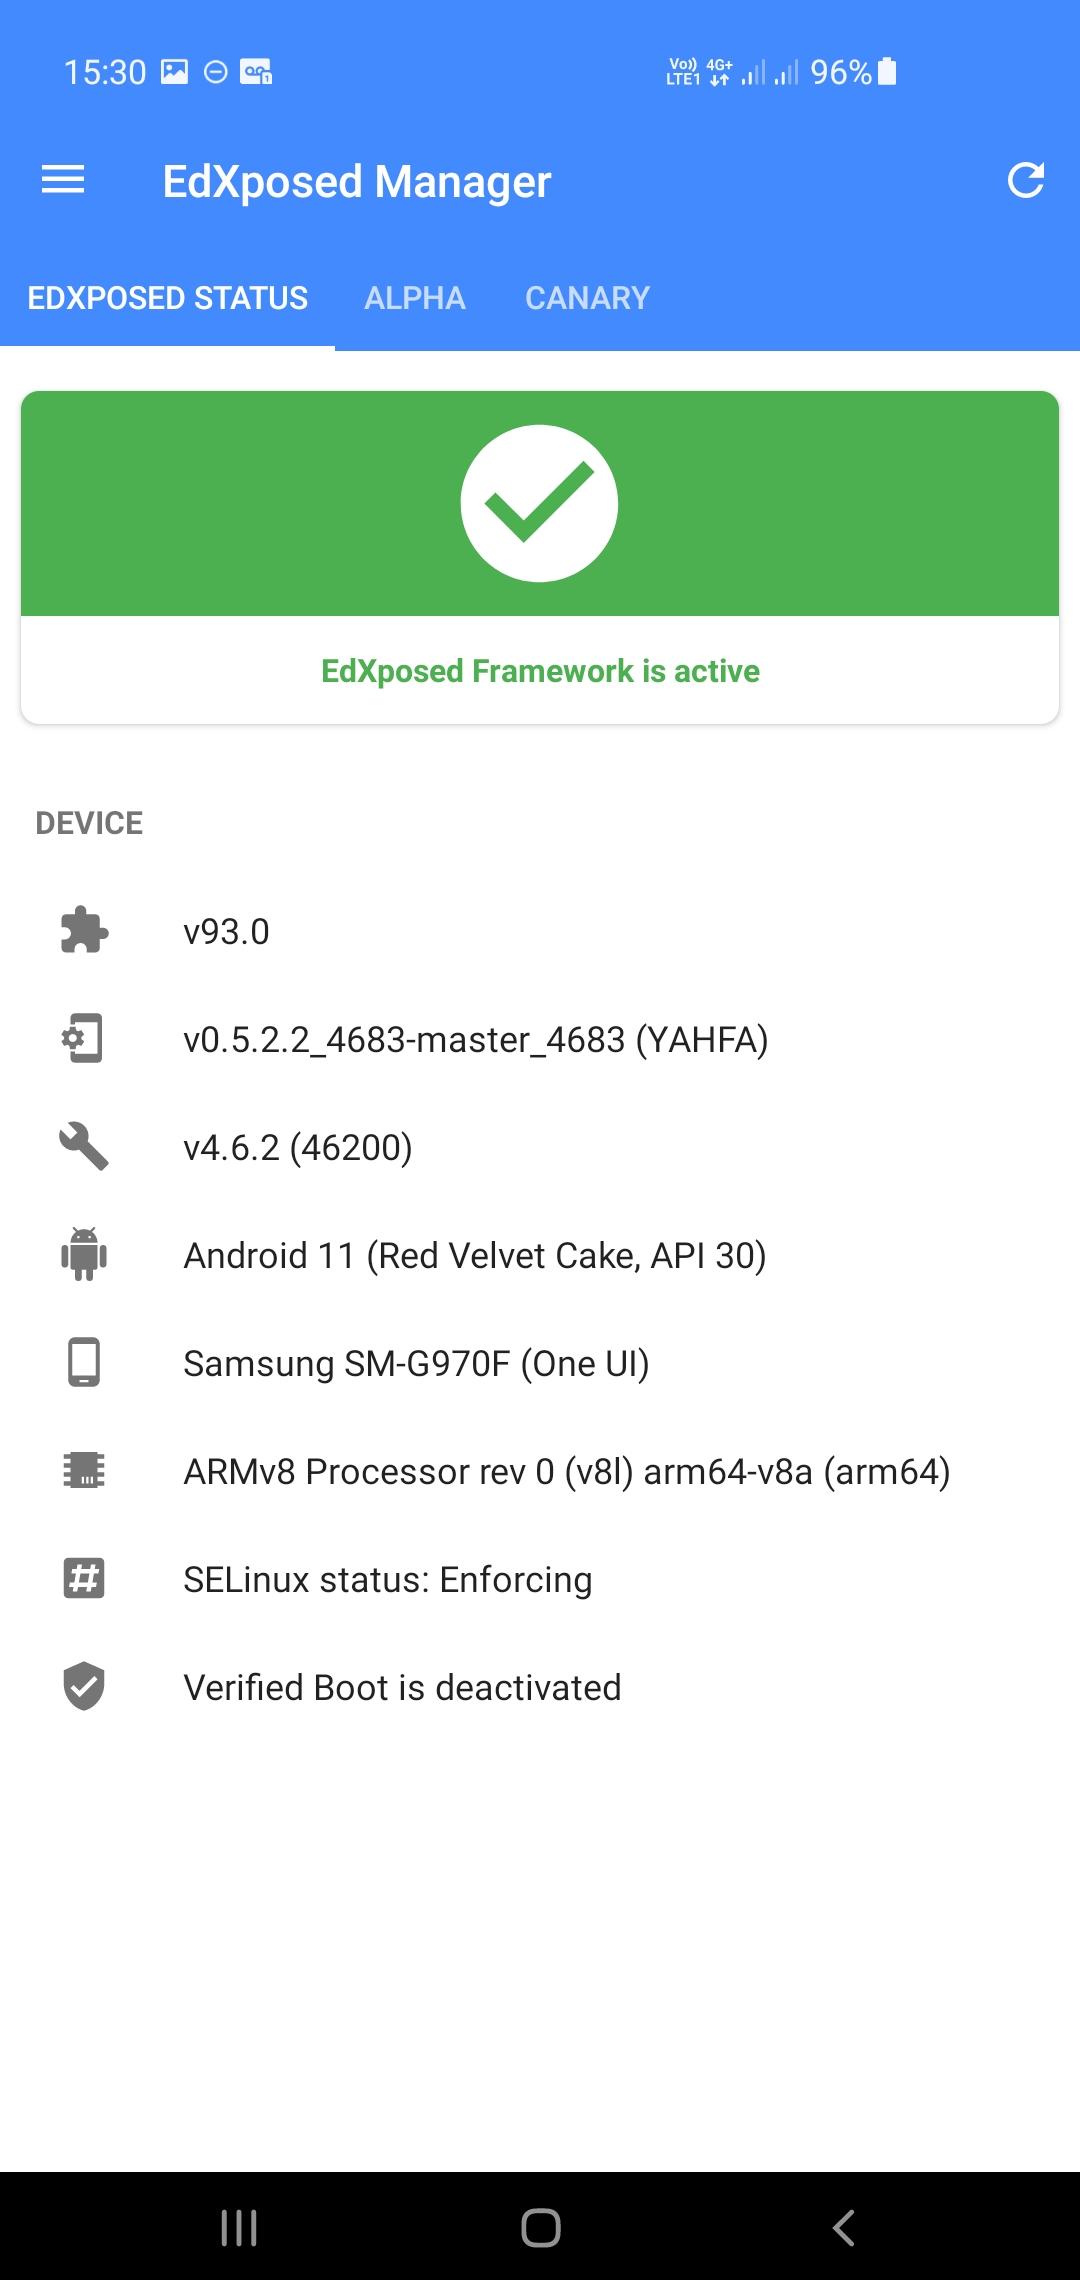 Screenshot_20210304-153052_EdXposed Manager.jpg